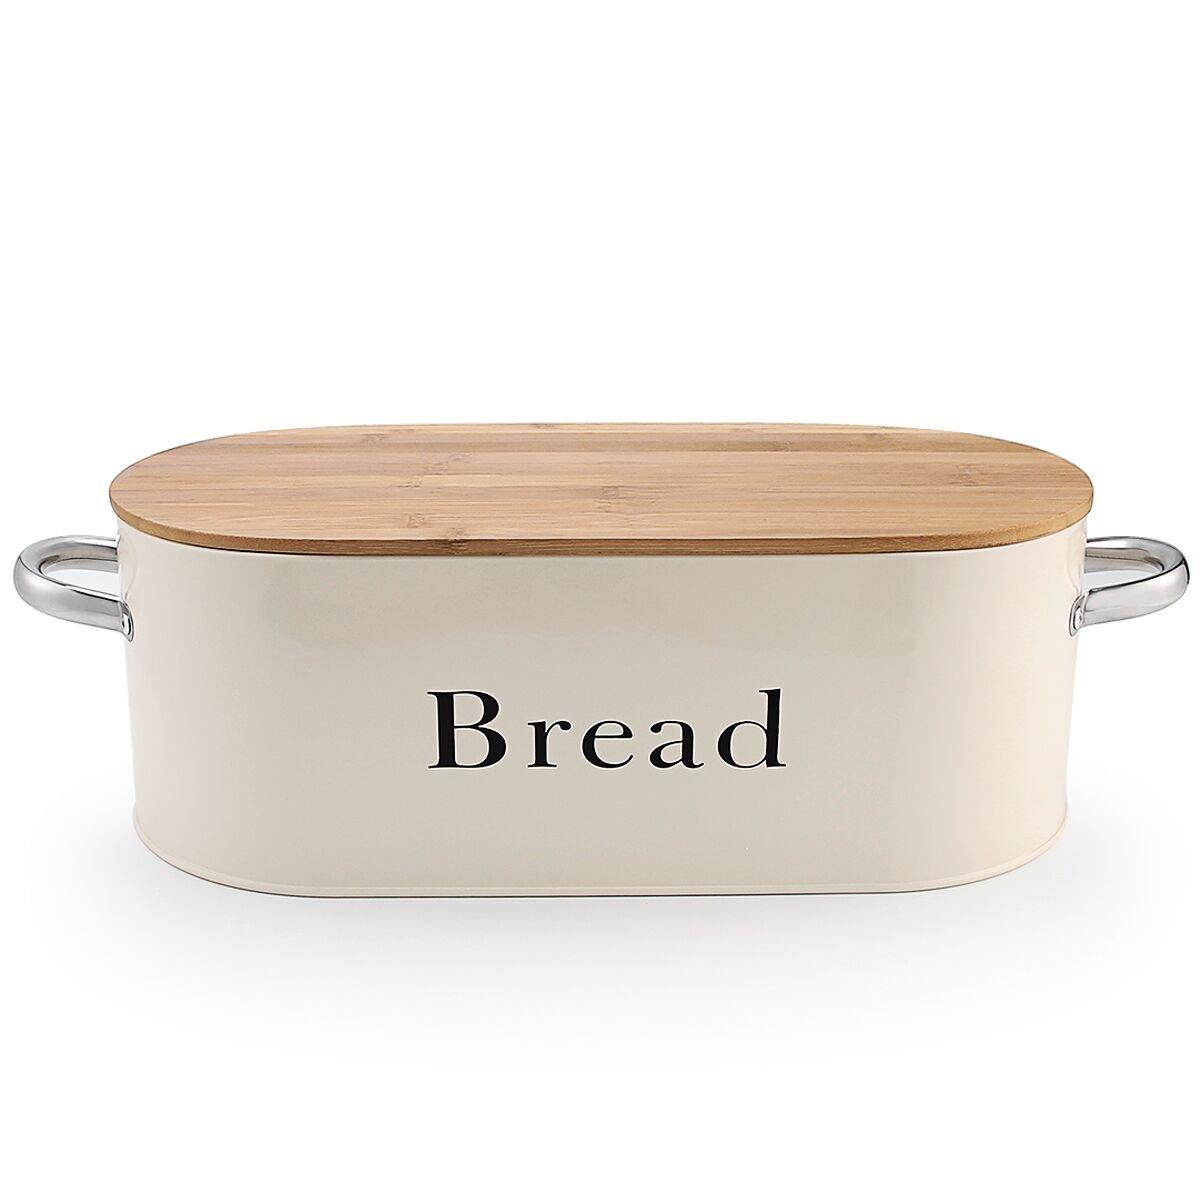 Tin bread box drawer insert - Svebake Bread Box Vintage Retro Metal Bread Bin With Bamboo Lid And Handle Cream Included A Free Pdf Baking E Book